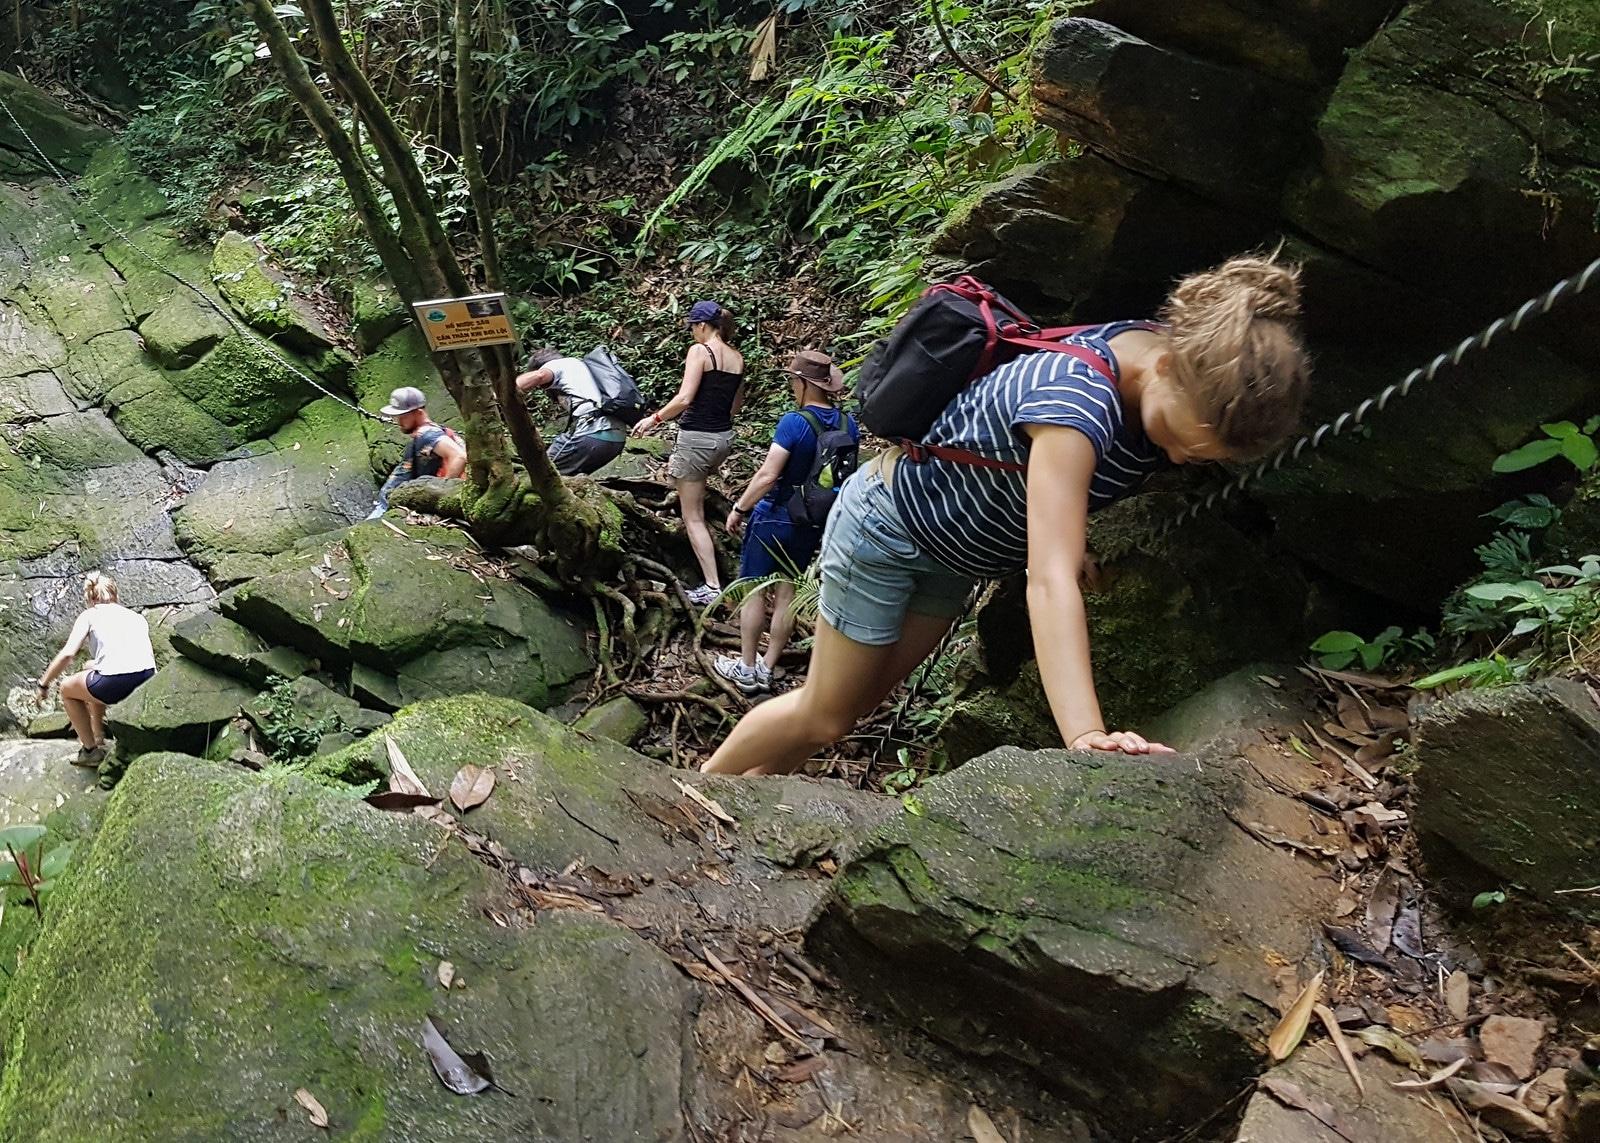 Hiking in Bach Mã National Park Vietnam